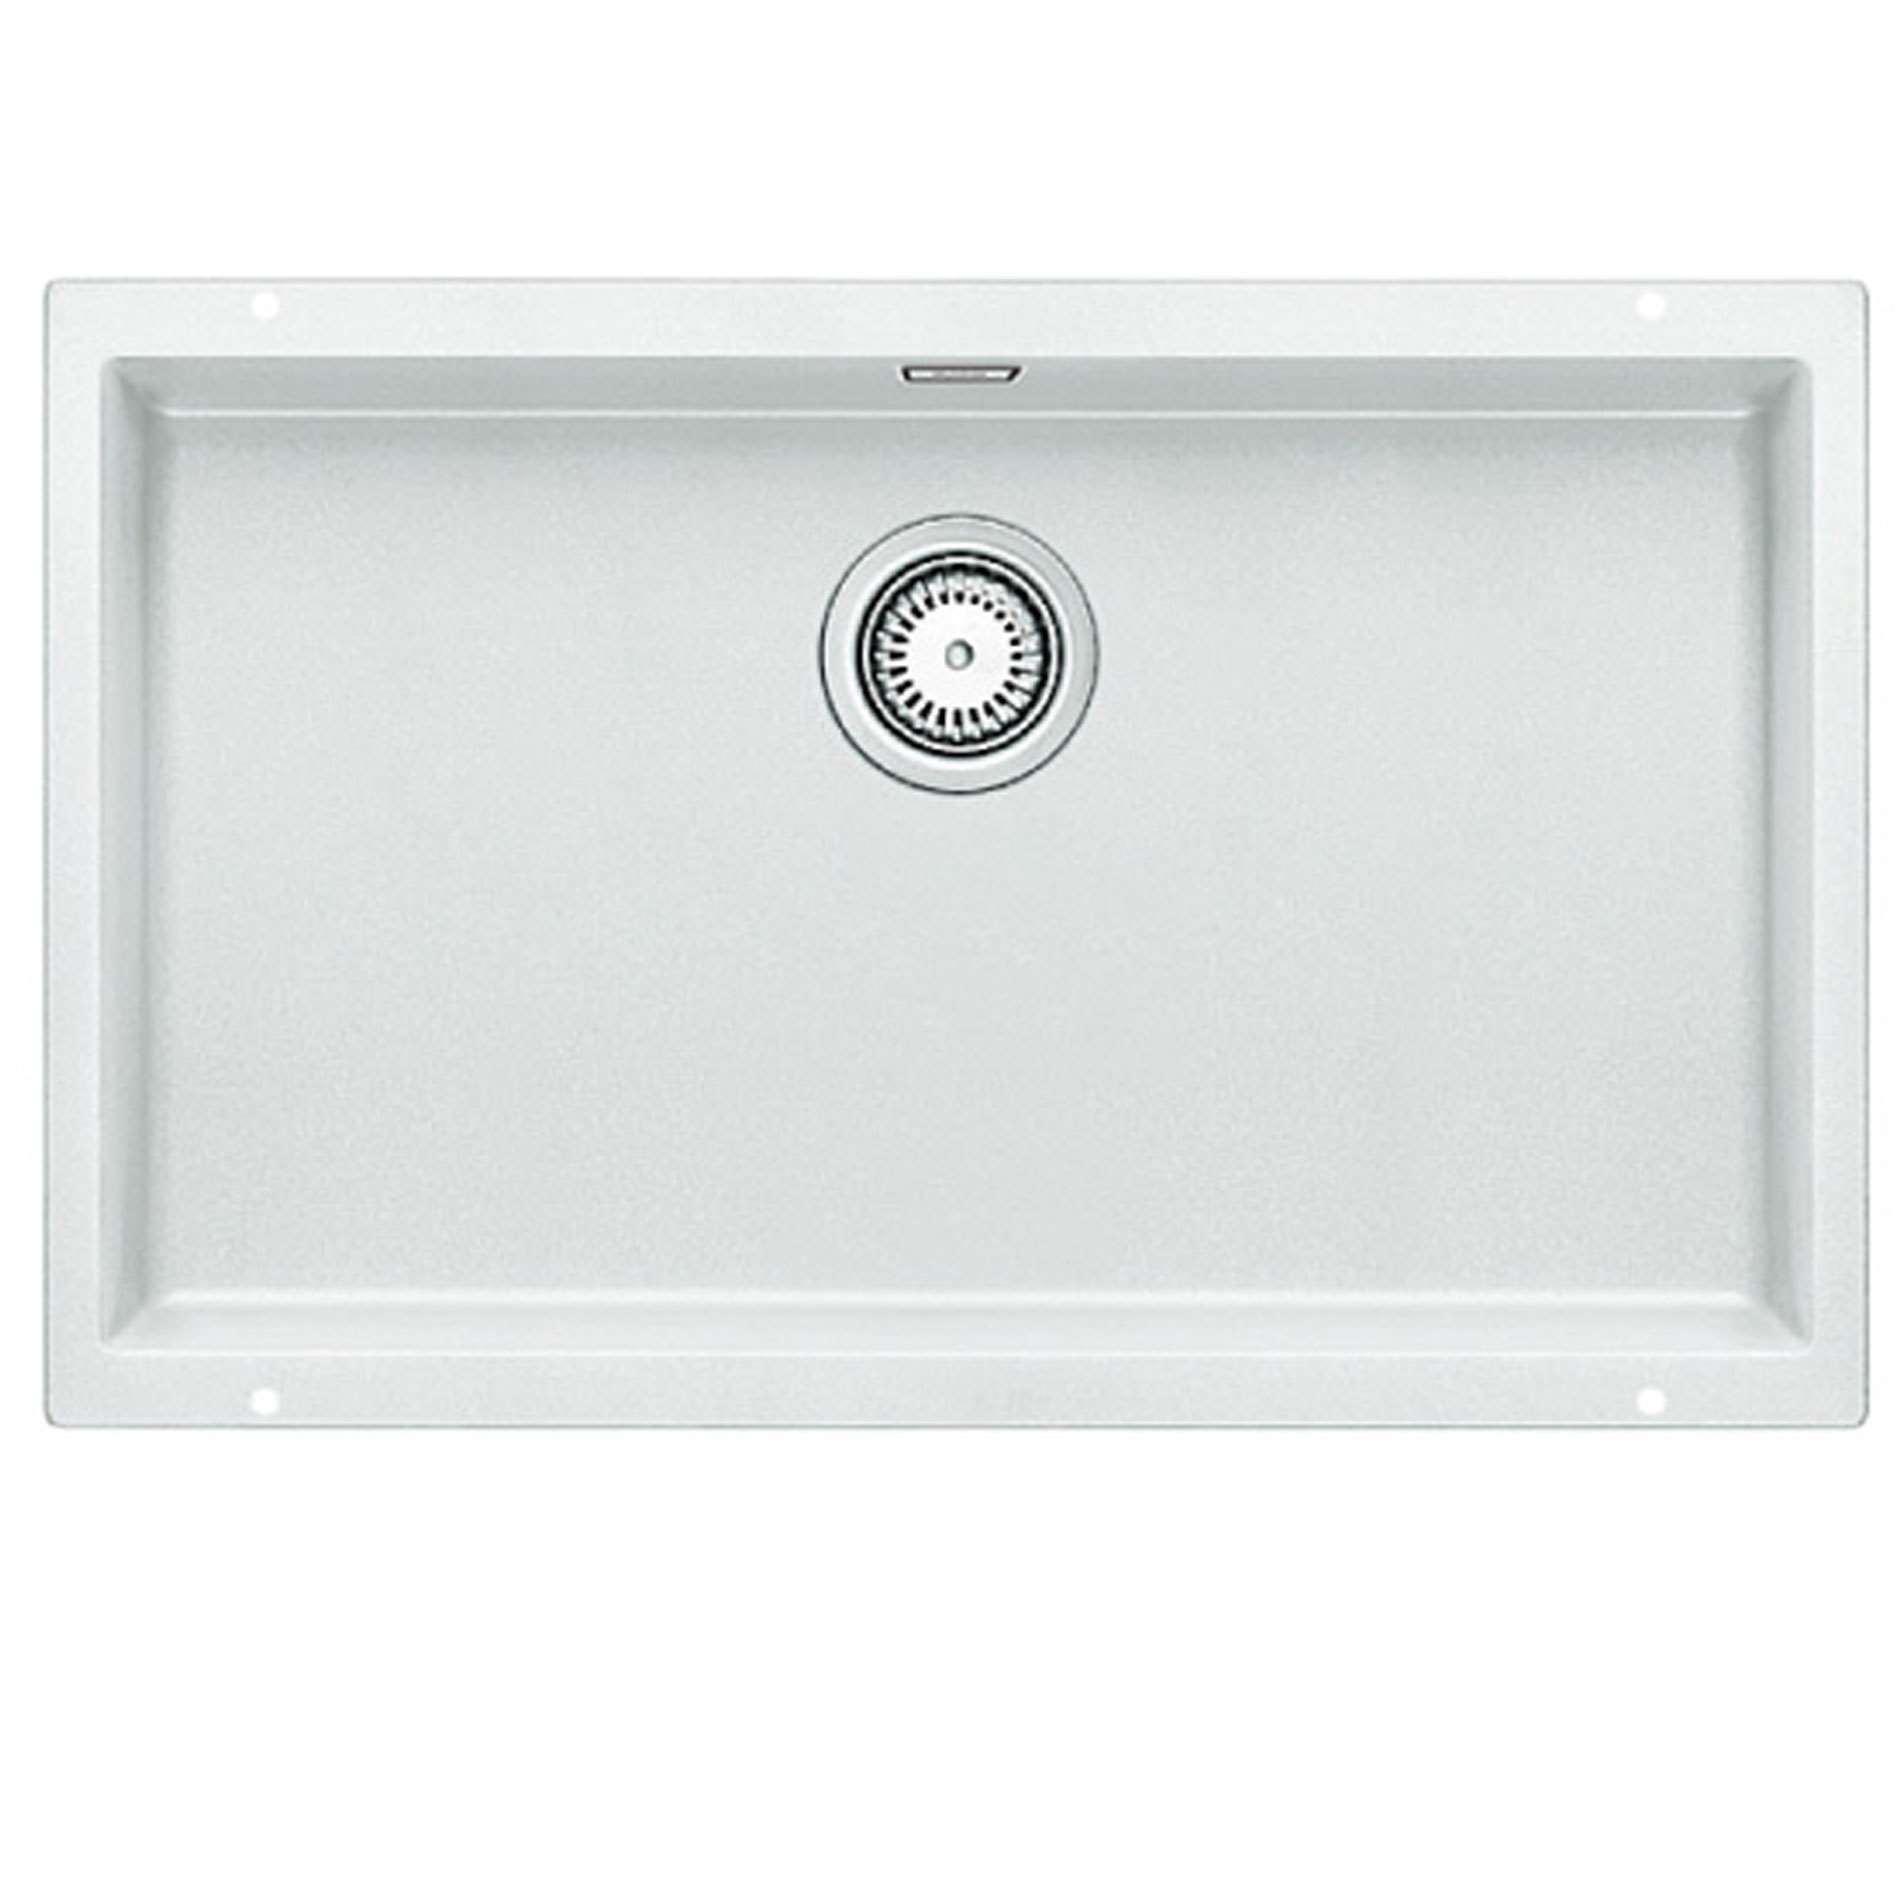 blanco subline 700 u white silgranit sink kitchen sinks. Black Bedroom Furniture Sets. Home Design Ideas